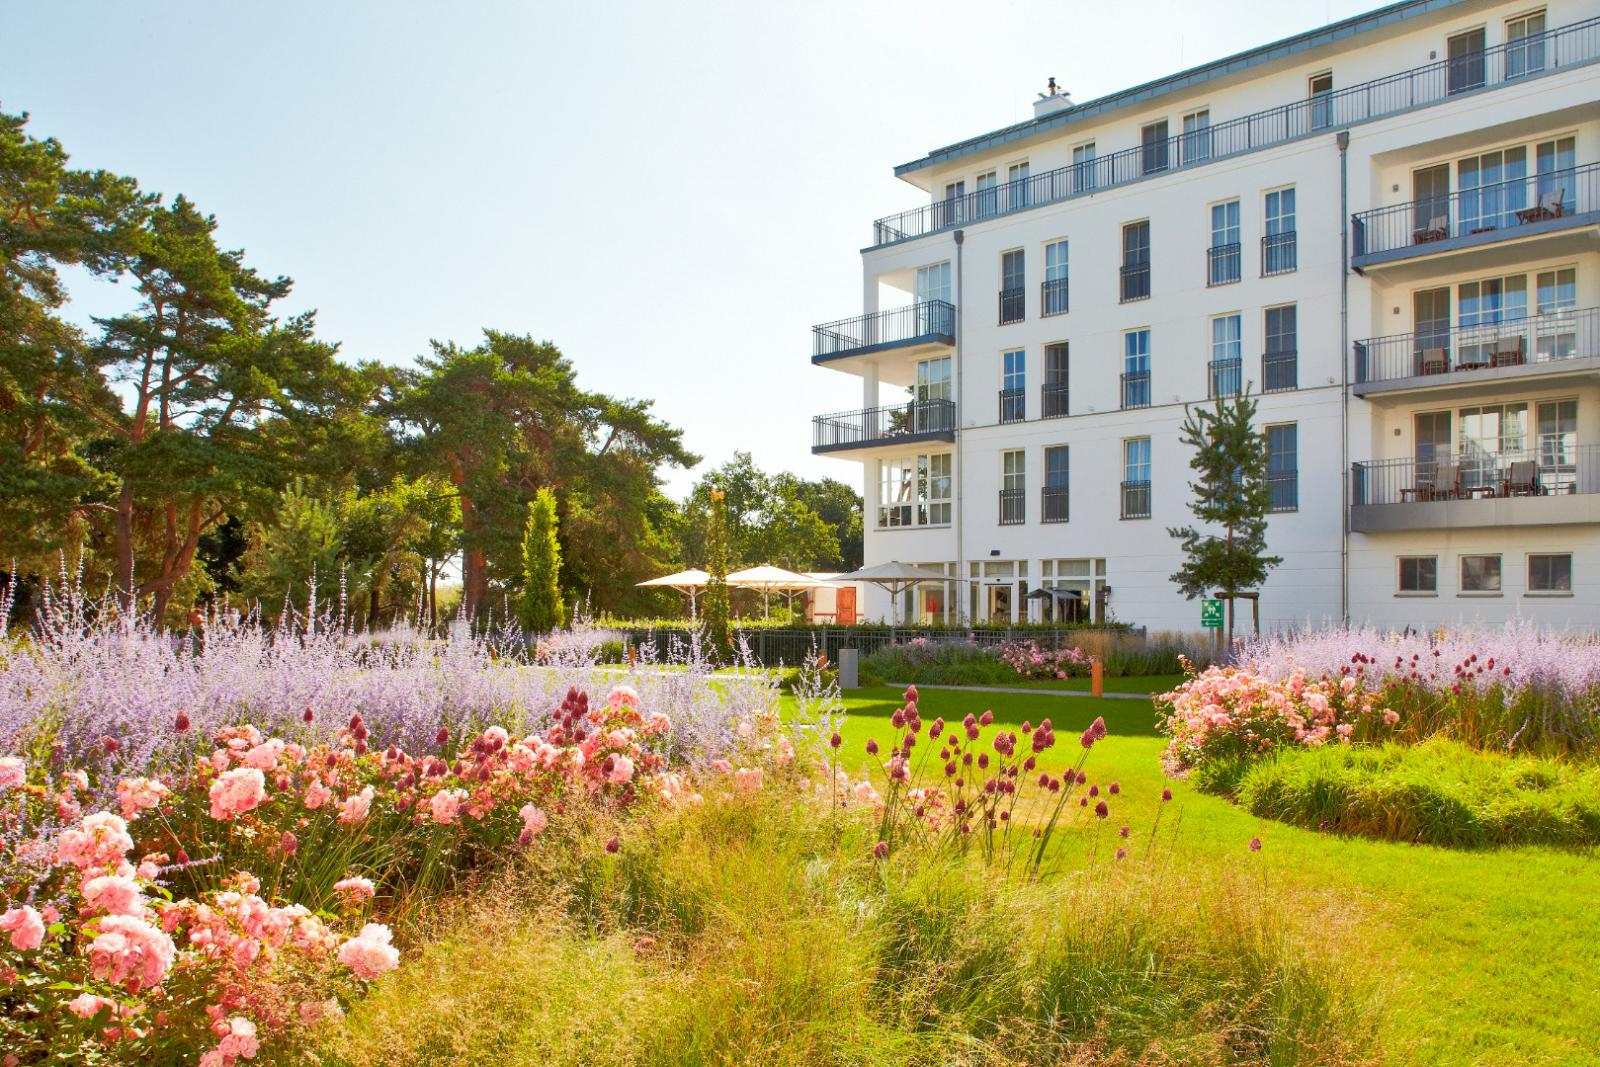 Steigenberger Grand Hotel Usedom